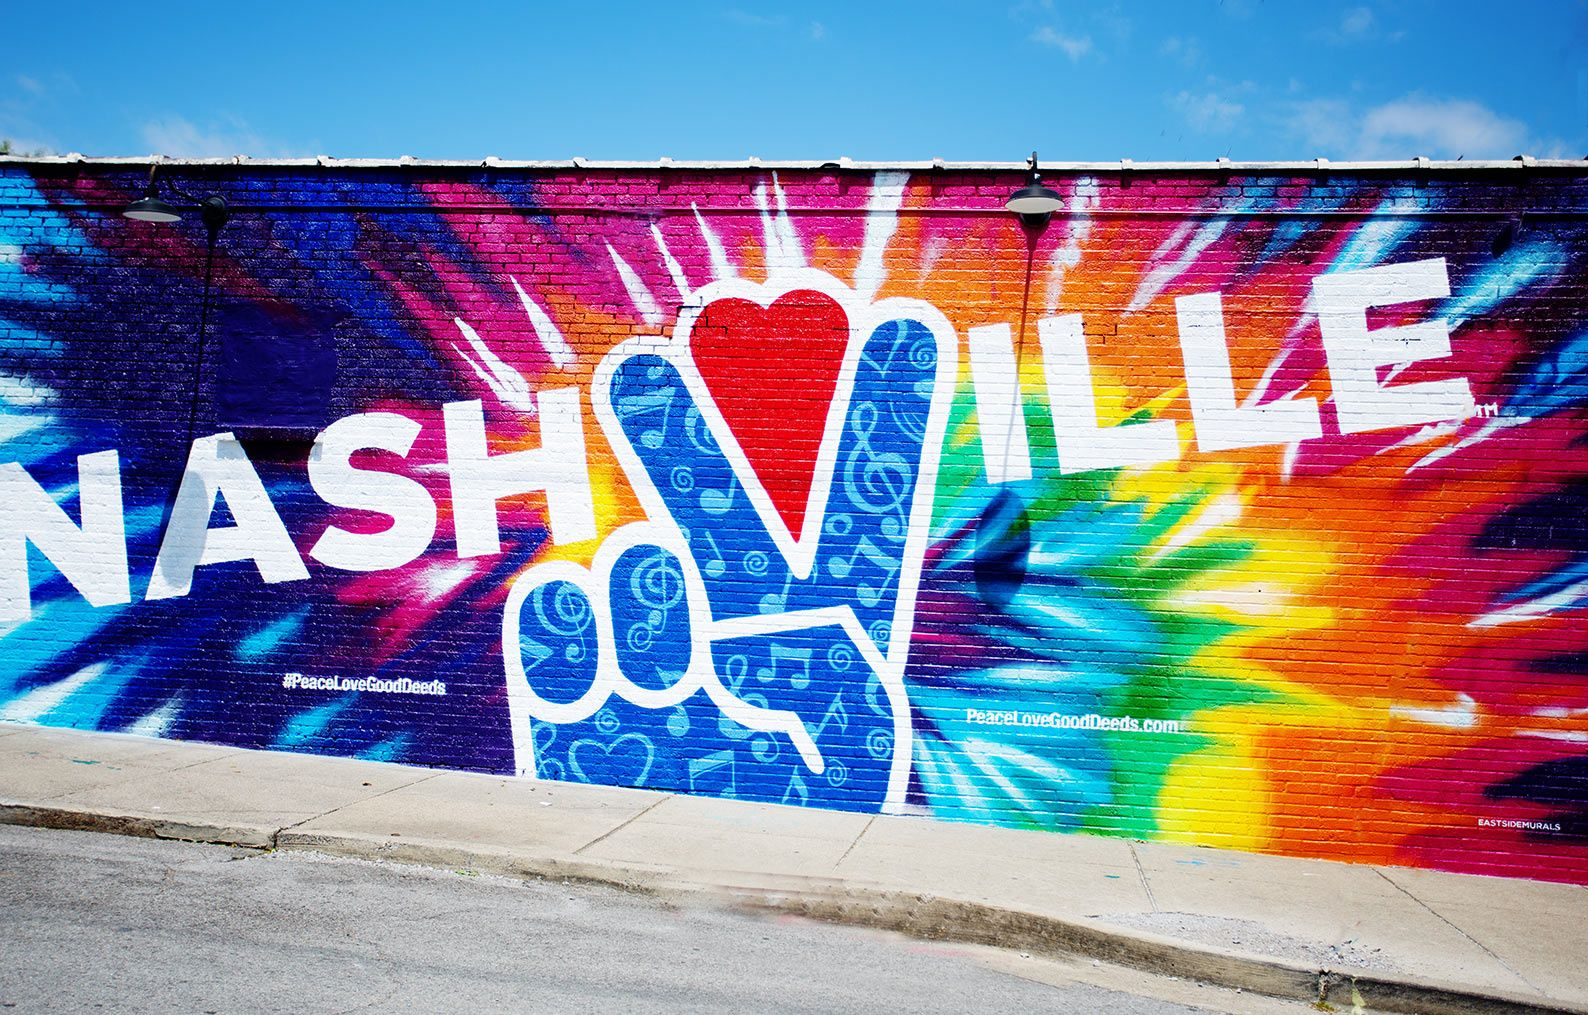 Nashville peace sign mural.